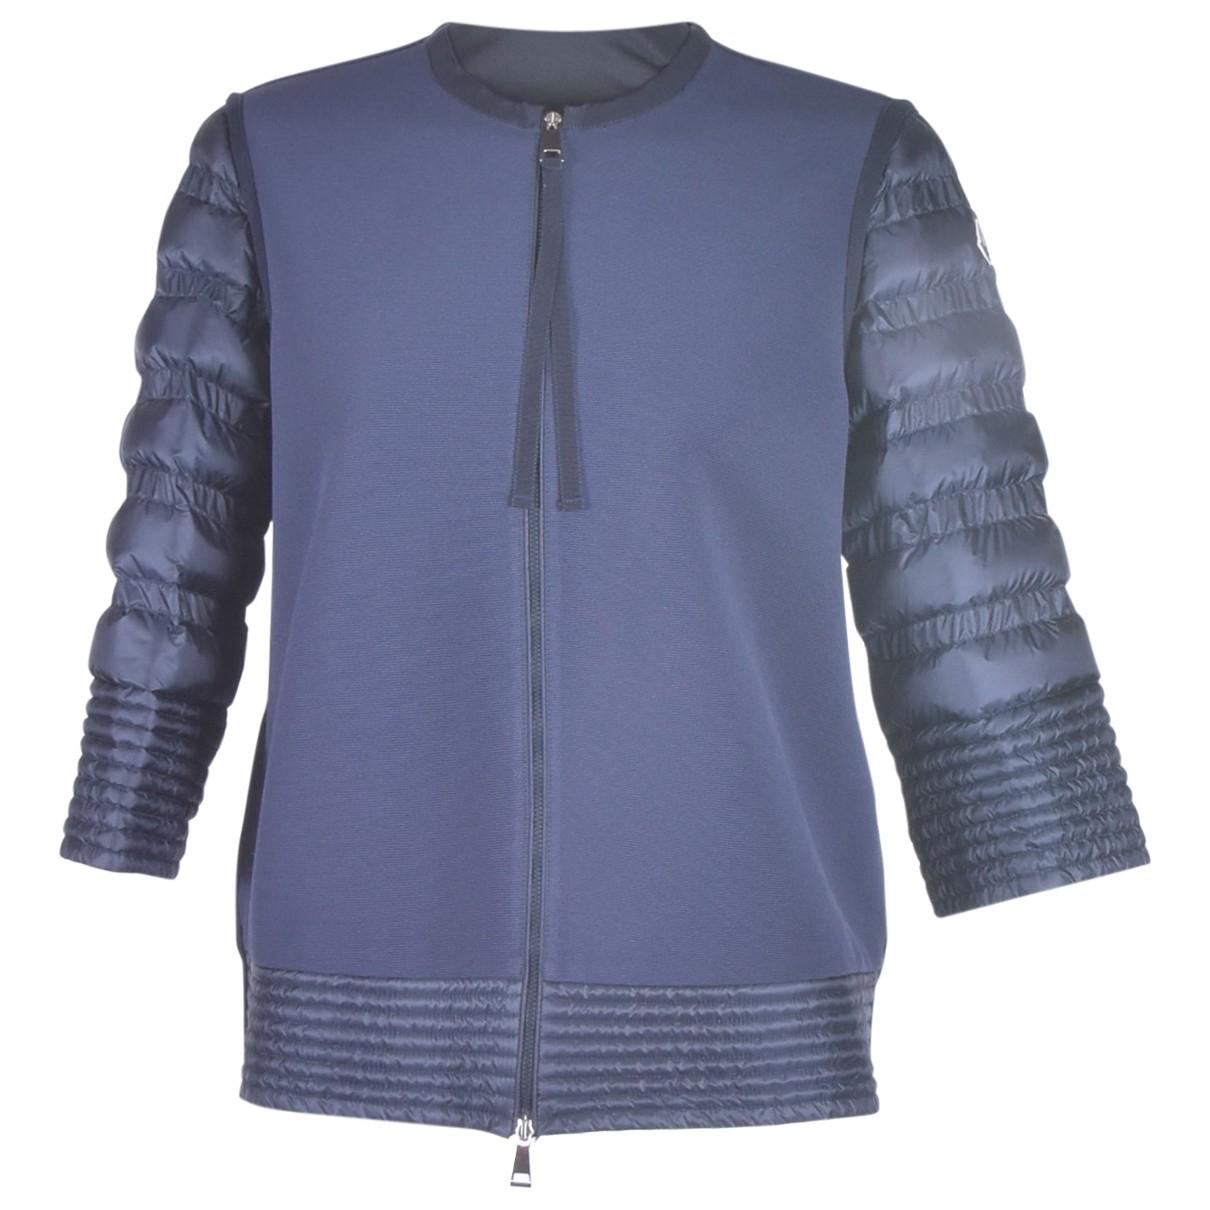 Moncler \N Blue Cotton jacket for Women L International